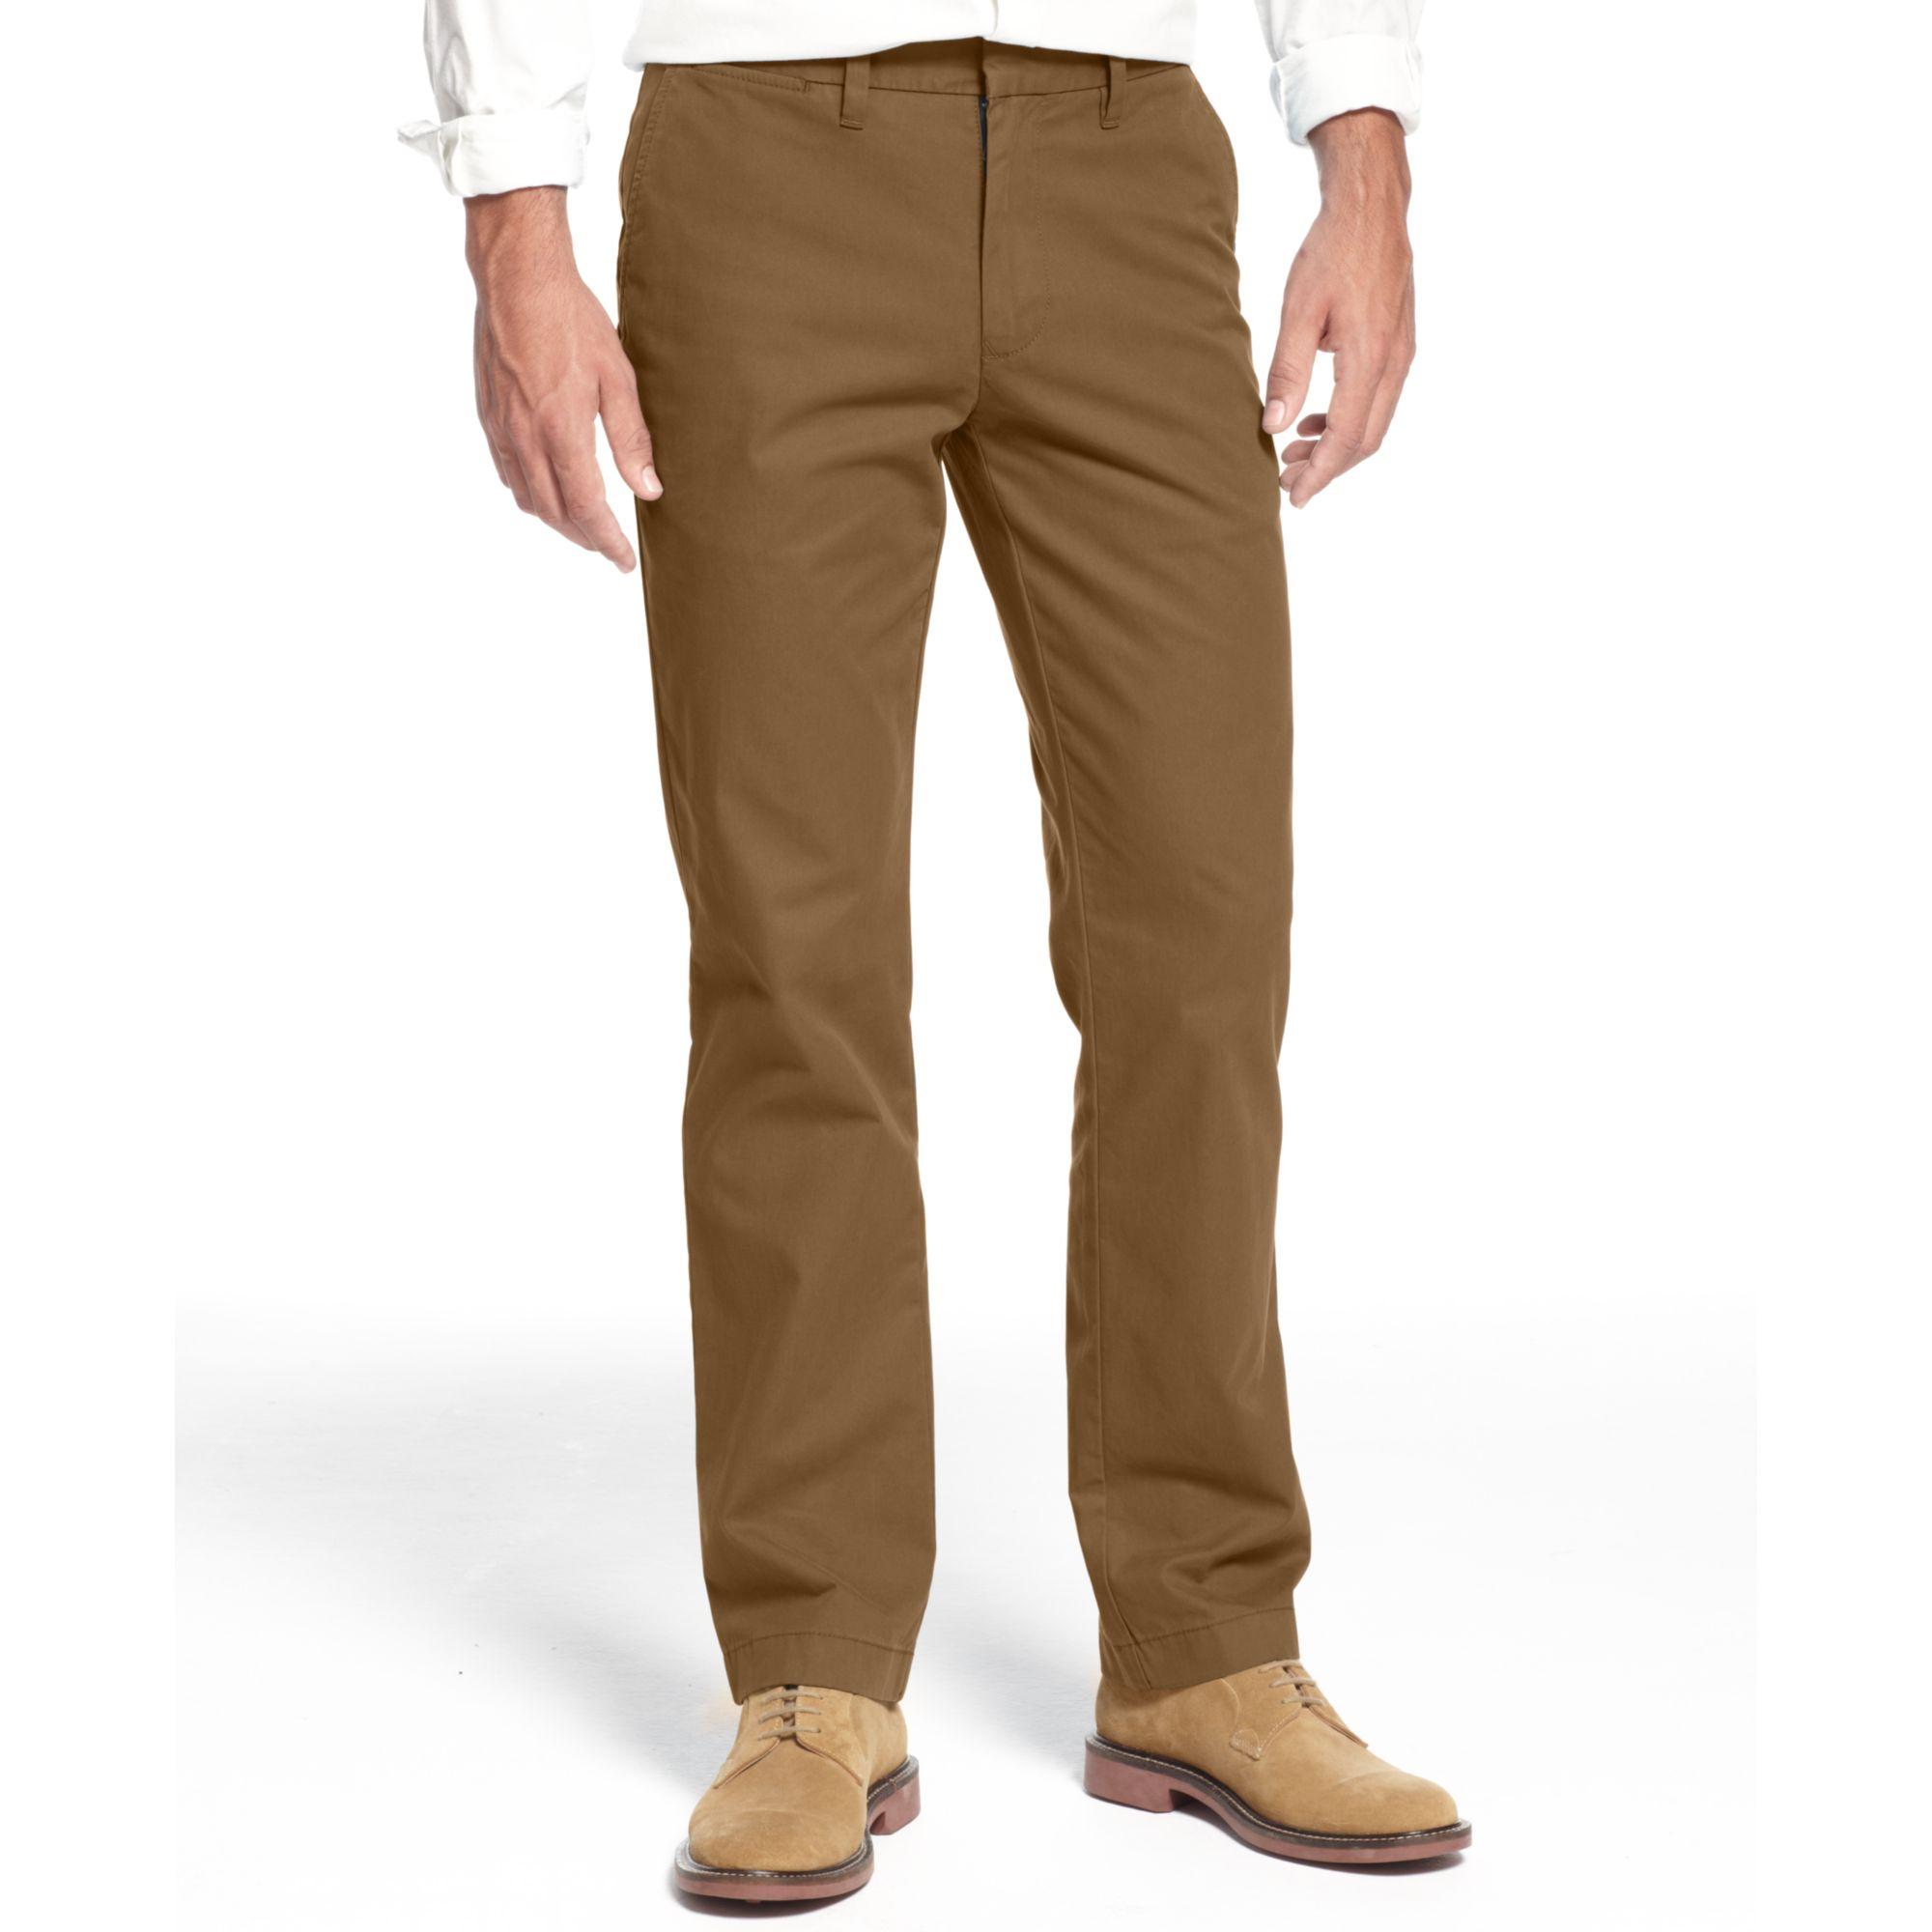 tommy hilfiger mercer customfit chino pants in brown for. Black Bedroom Furniture Sets. Home Design Ideas